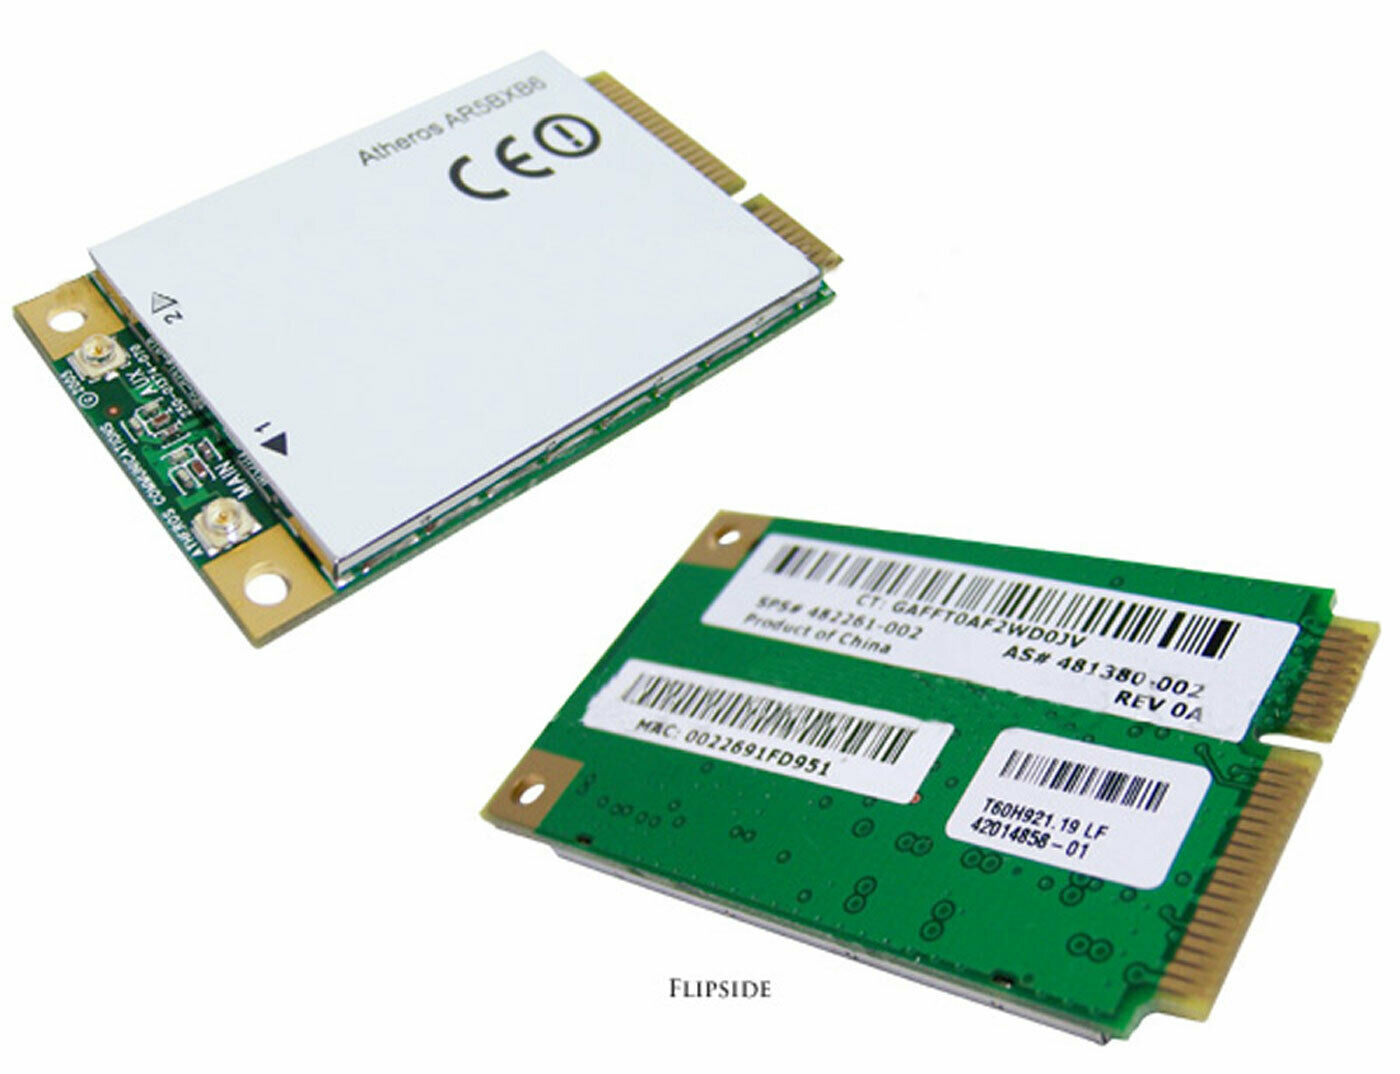 Atheros Wireless Mini-PCIe WiFi LAN 11abg Card AR5BXB6 a/b/g ThinkPad 481380-002